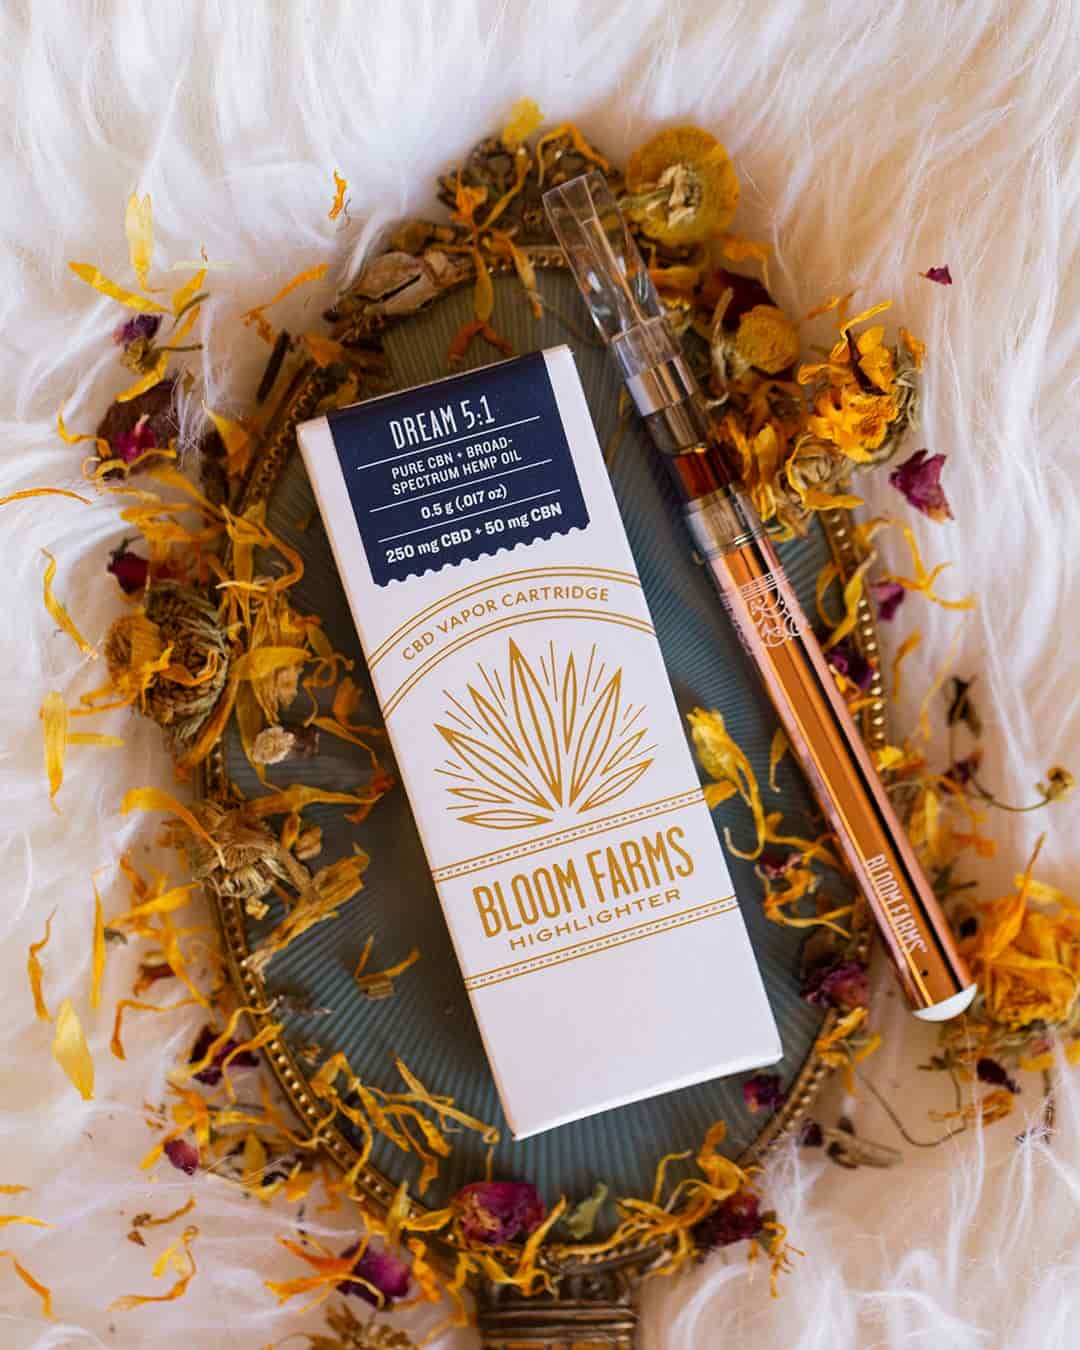 Bloom Farms Vape Pen